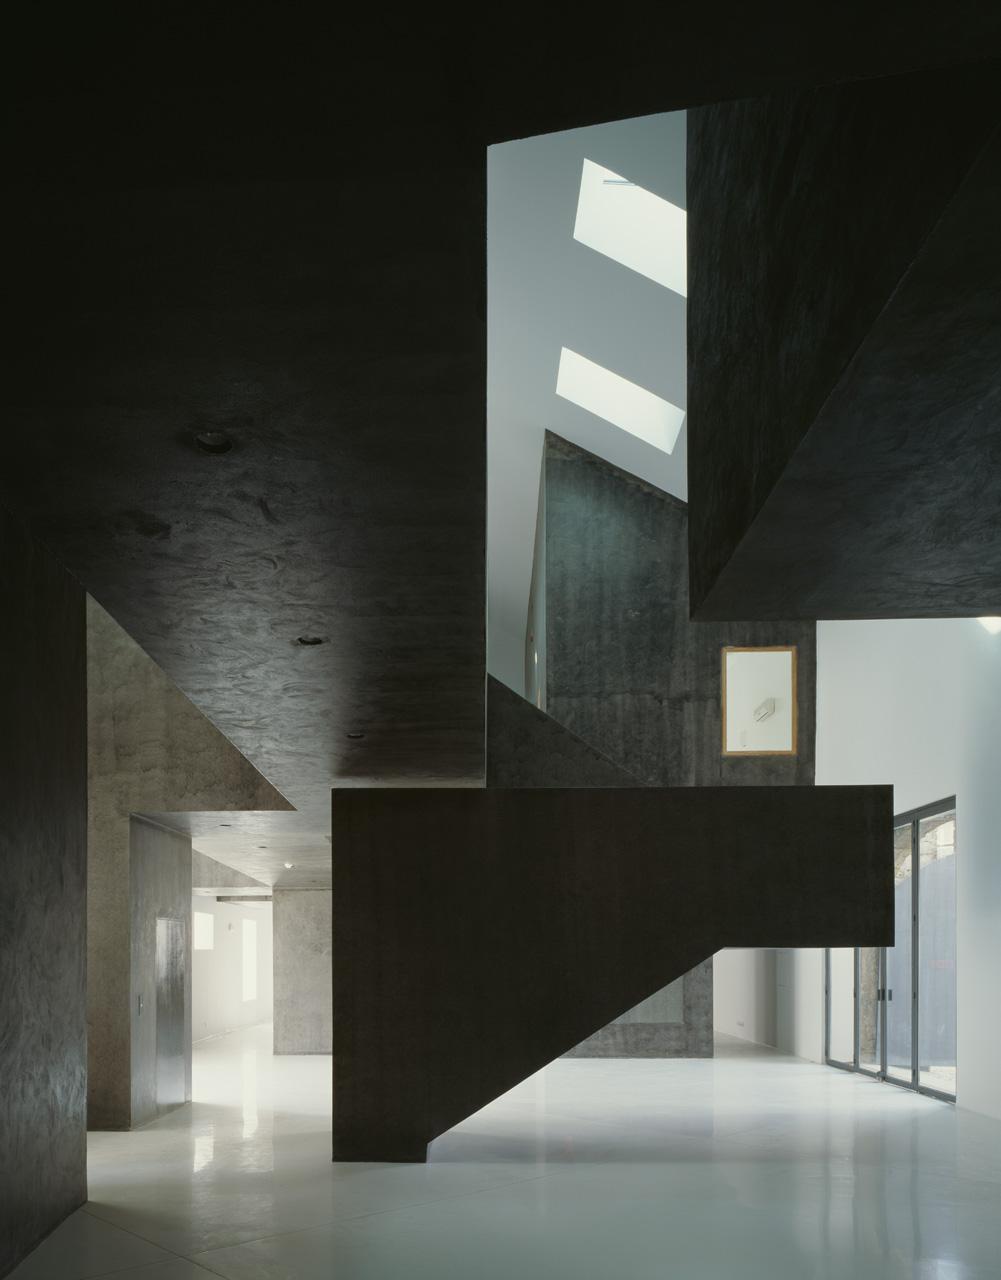 Casa dos Cubos / Embaixada arquitectura, Cortesia Embaixada arquitectura